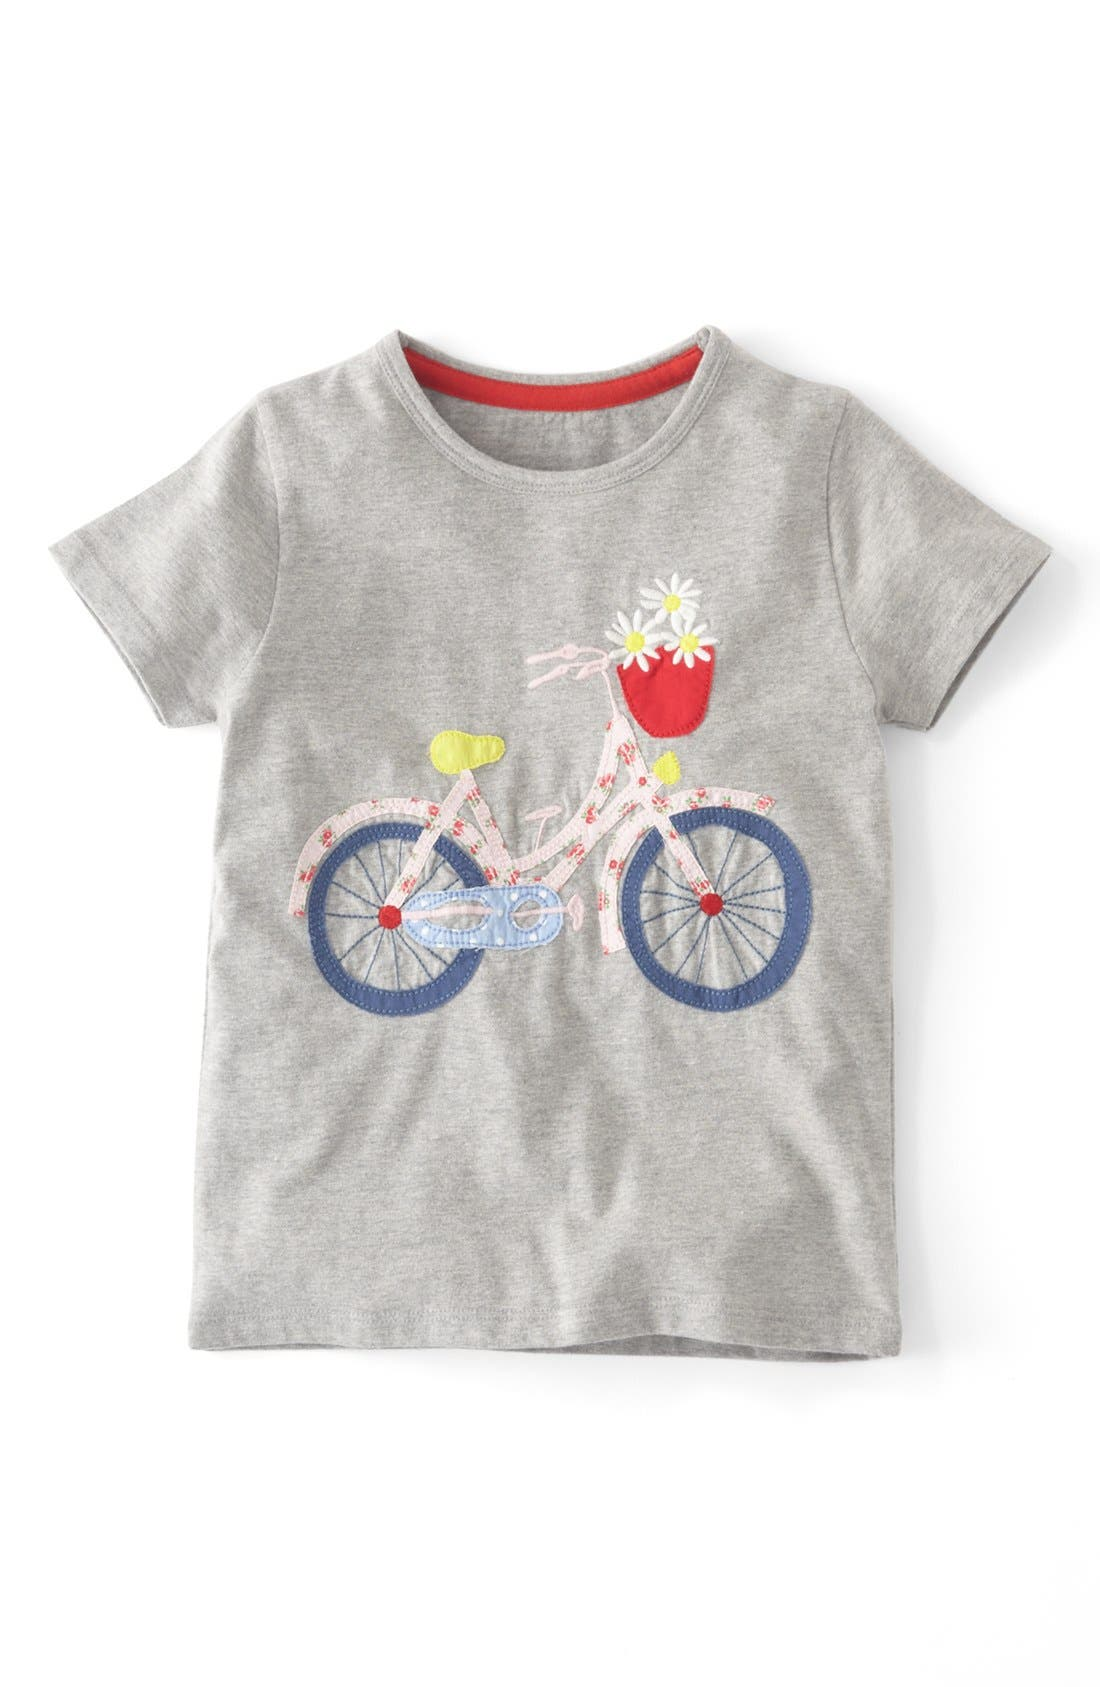 Alternate Image 1 Selected - Mini Boden Patchwork Appliqué Tee (Toddler Girls, Little Girls & Big Girls)(Online Only)